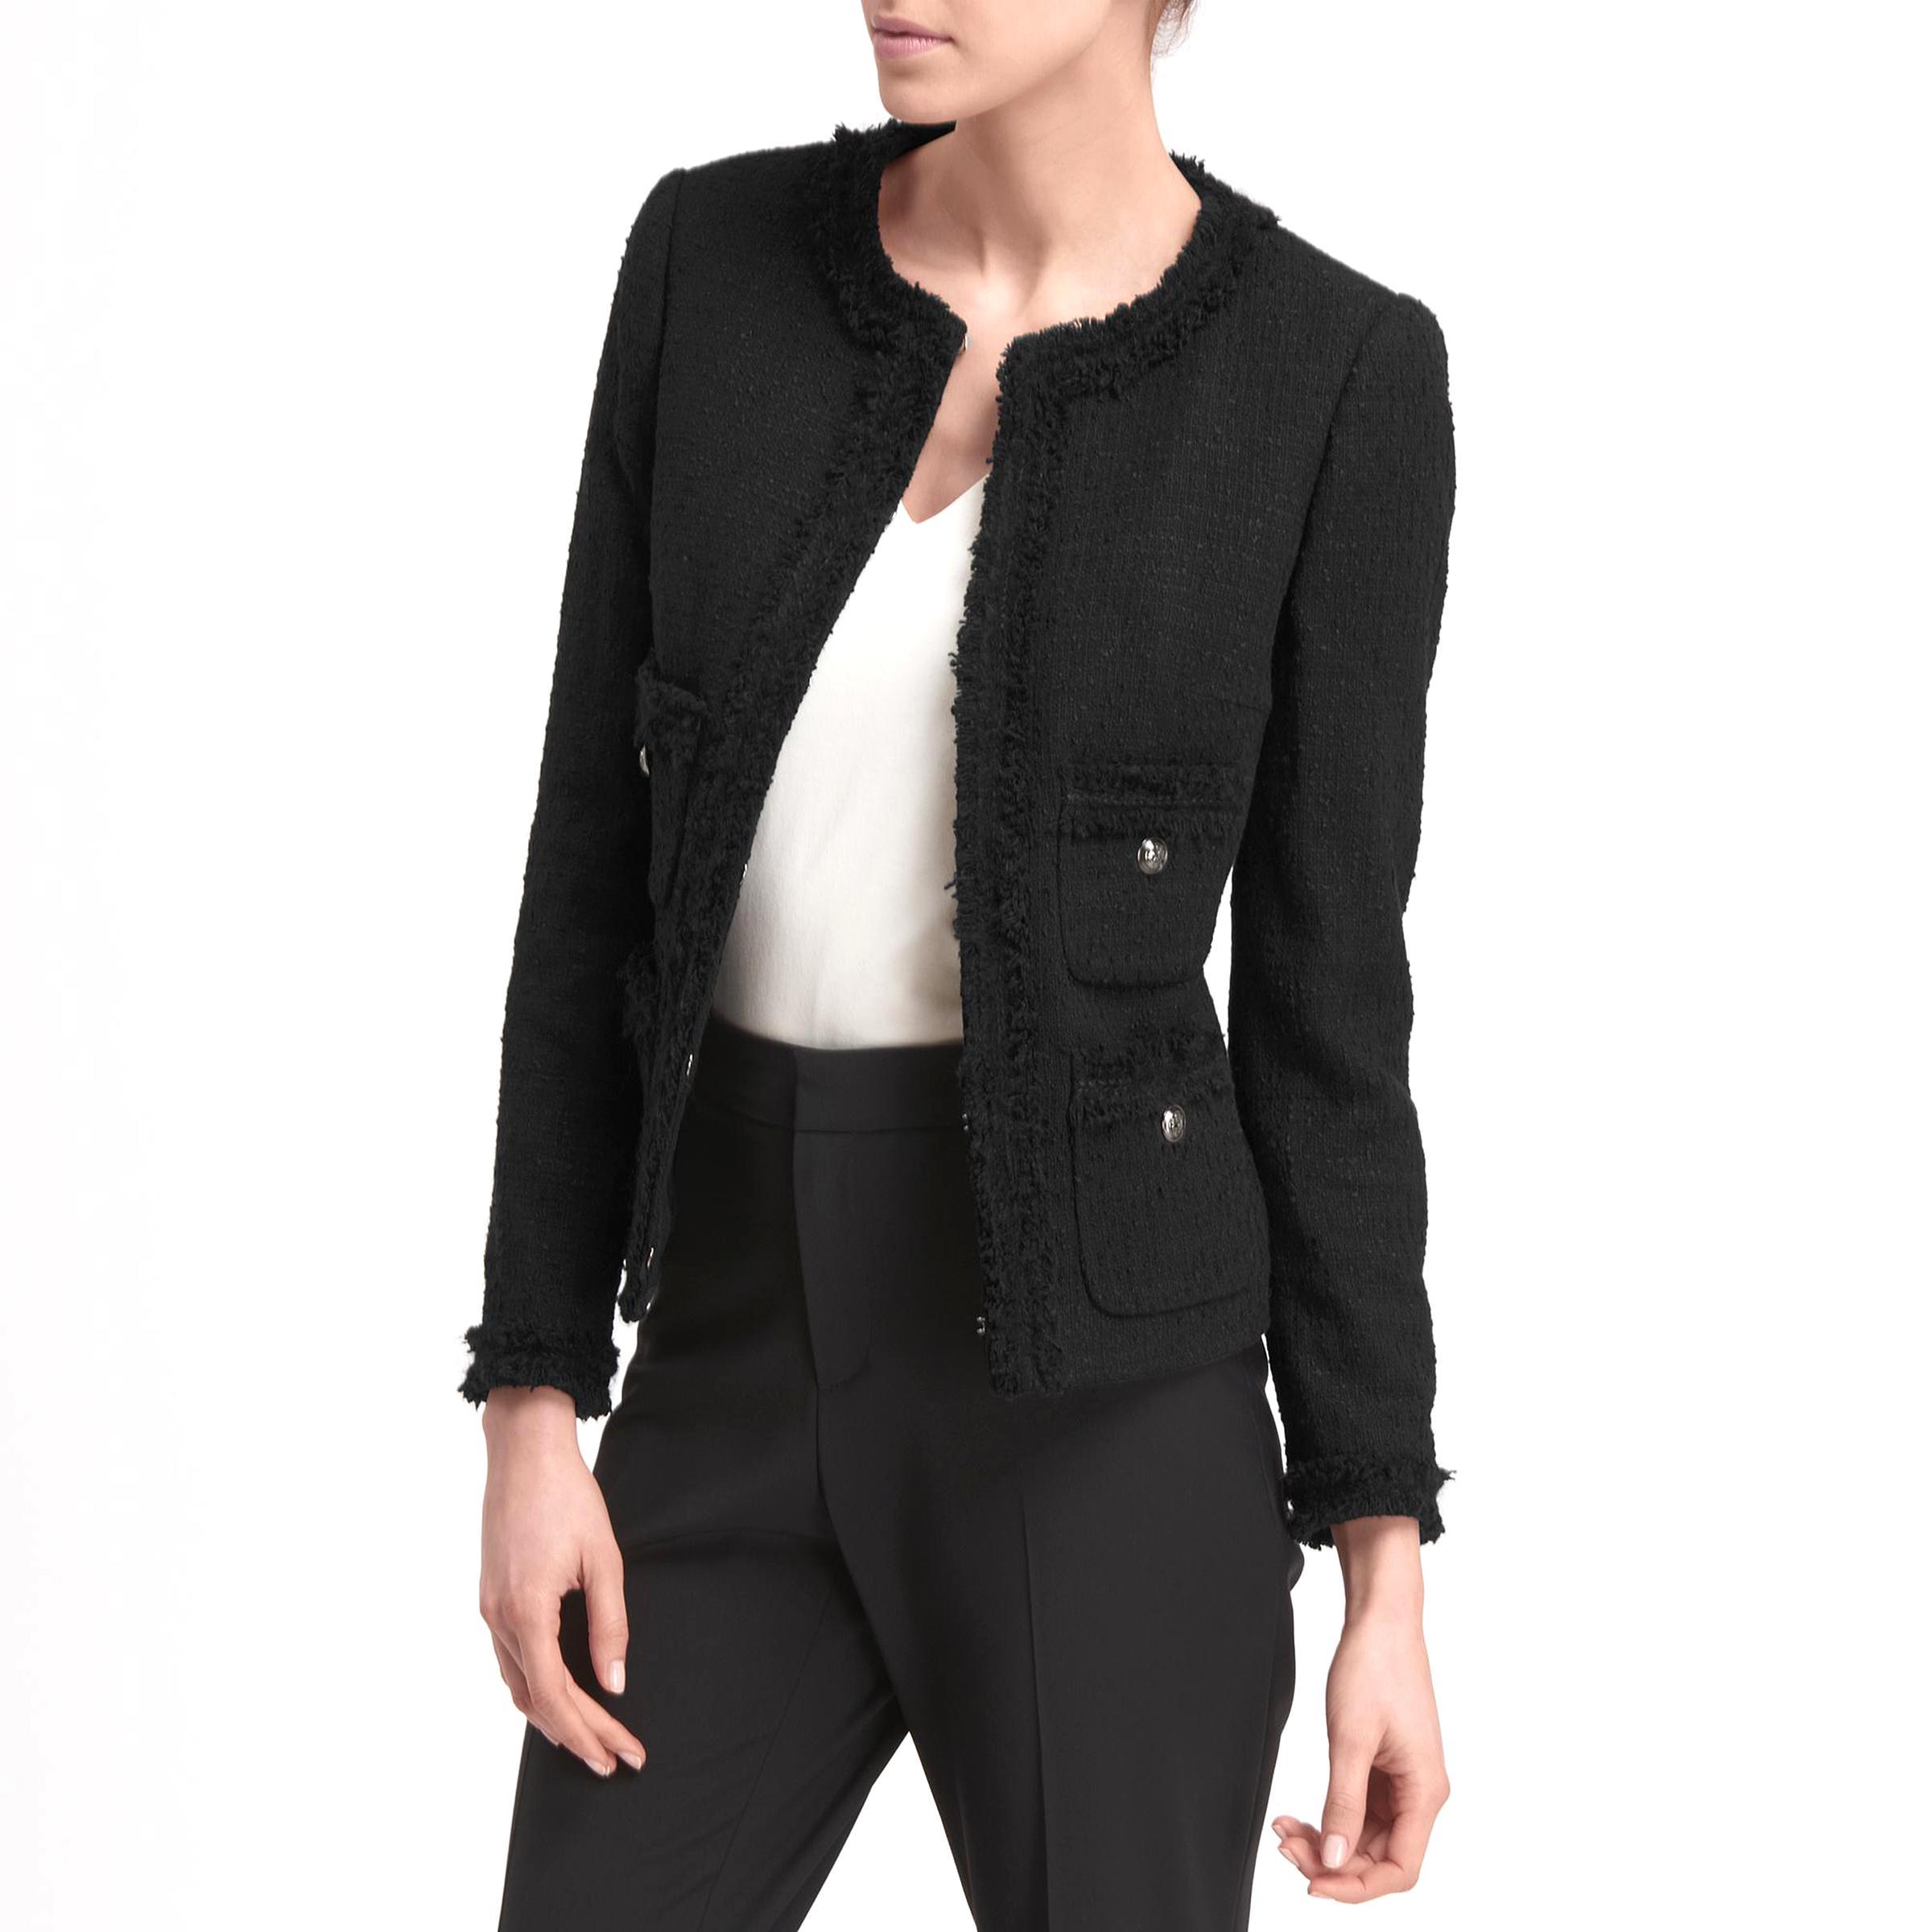 l k bennett jacket for sale